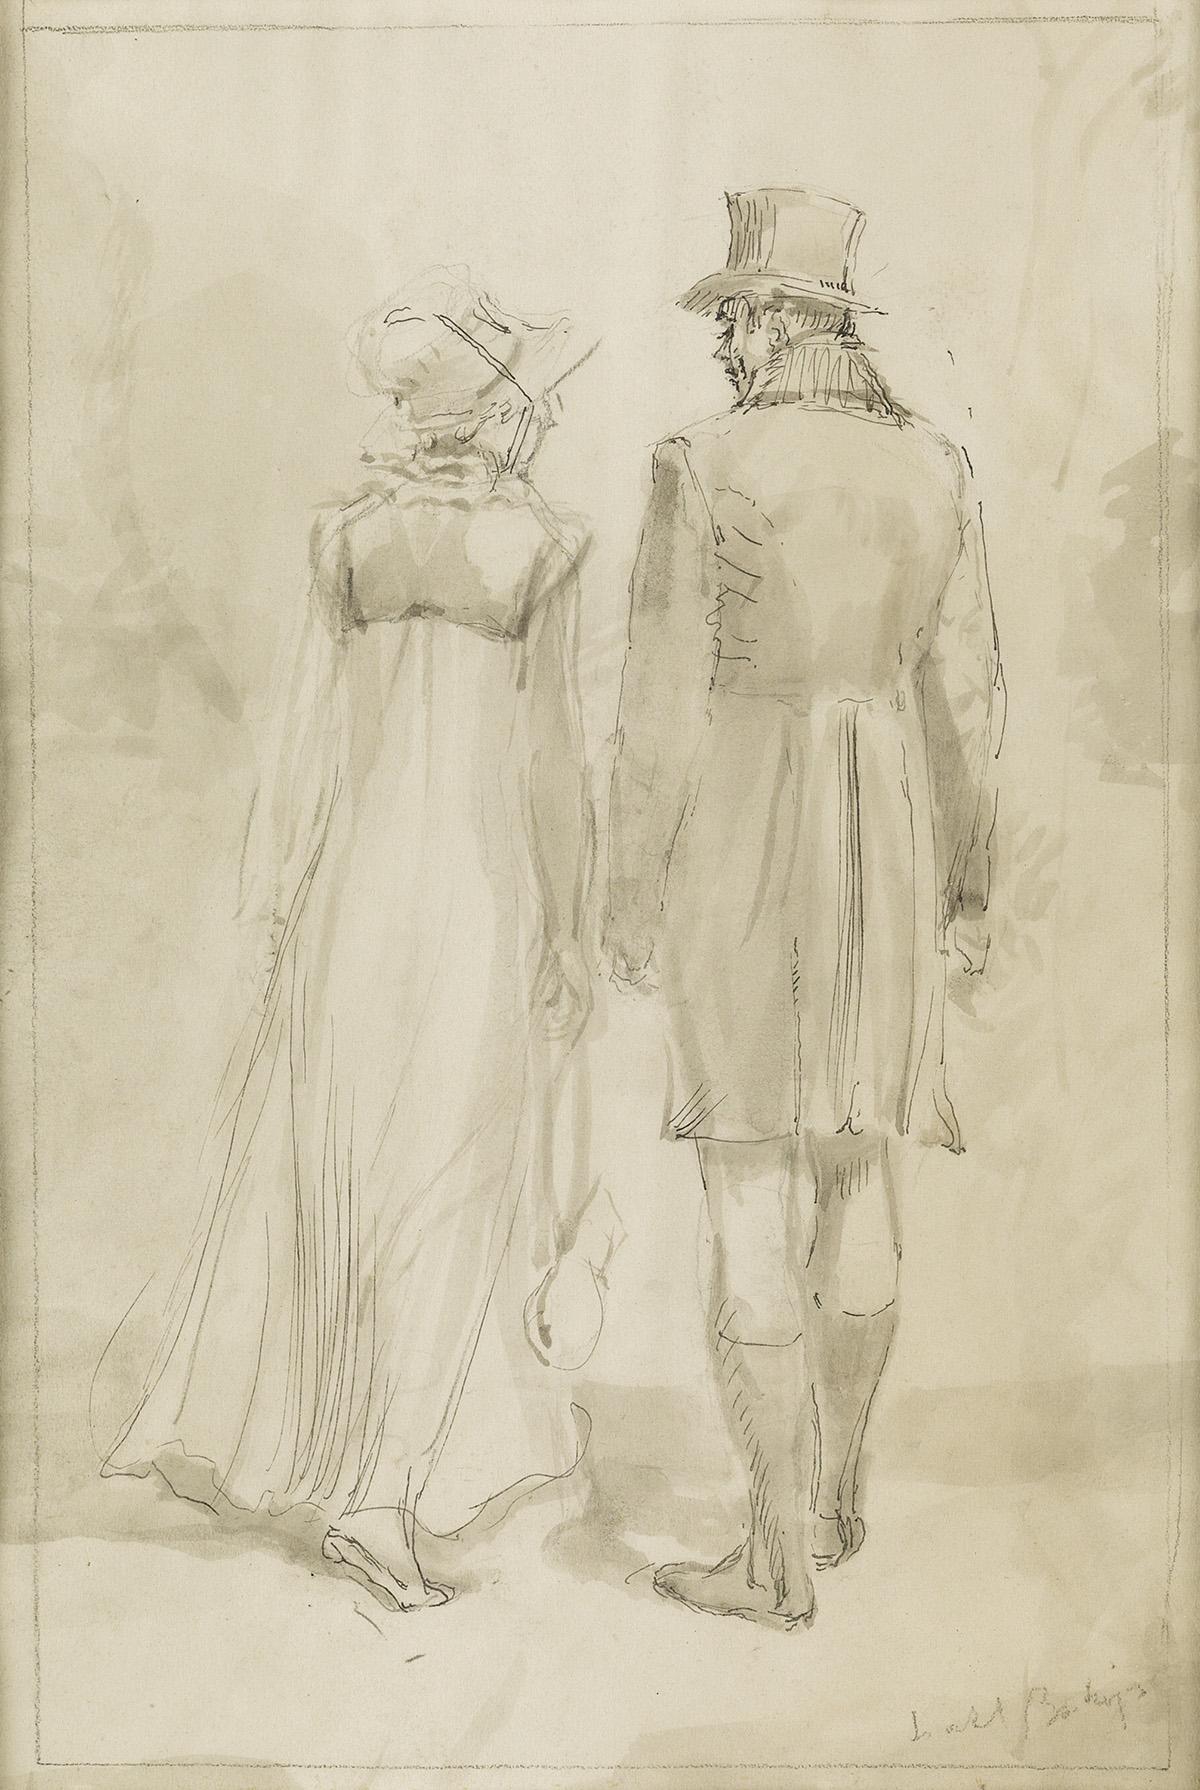 ISABEL BISHOP. (JANE AUSTEN / PRIDE AND PREJUDICE) Mr. Darcy and Elizabeth.